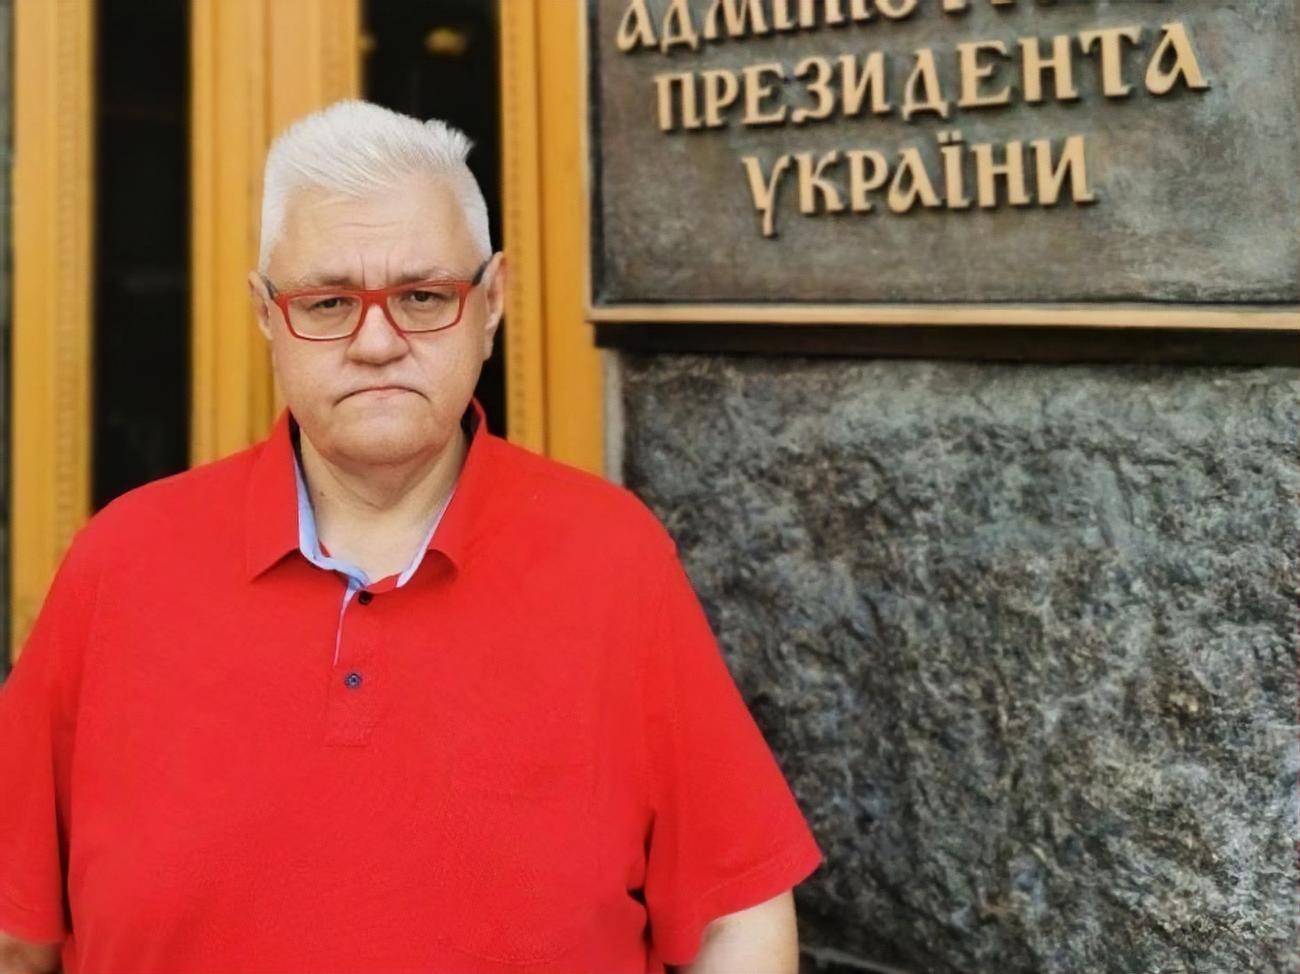 Сивохо, Донбасс, Националисты, роман цимбалюк, СНБО